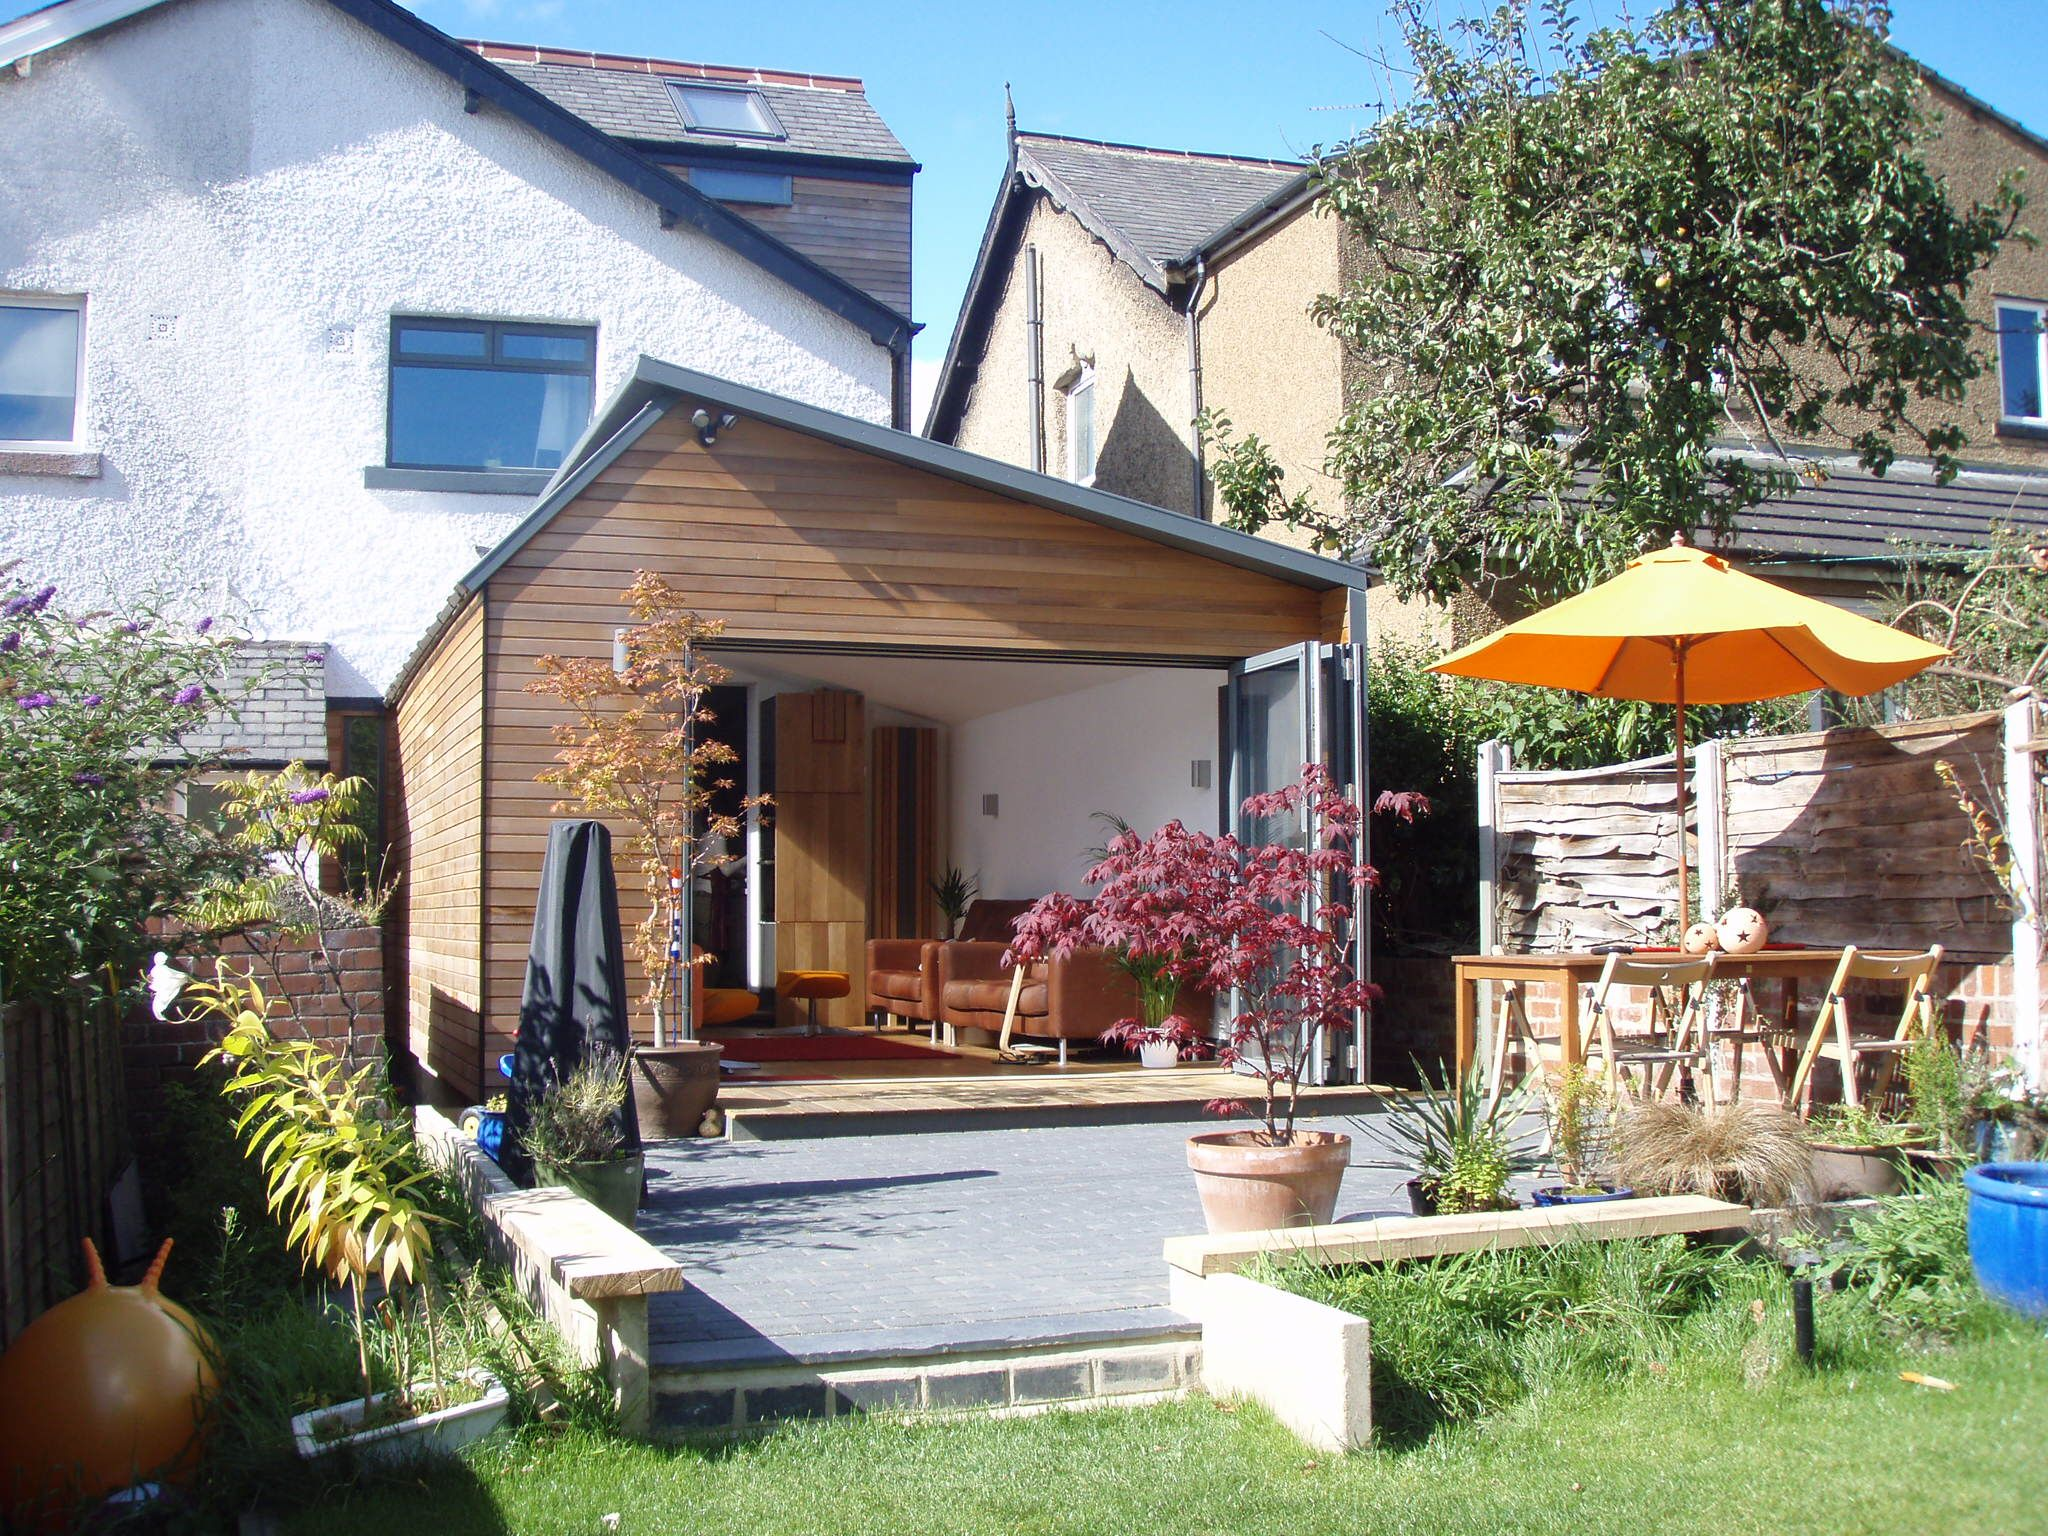 Sms Timber Frame- Contemporary Timber Frame Garden Room Extension